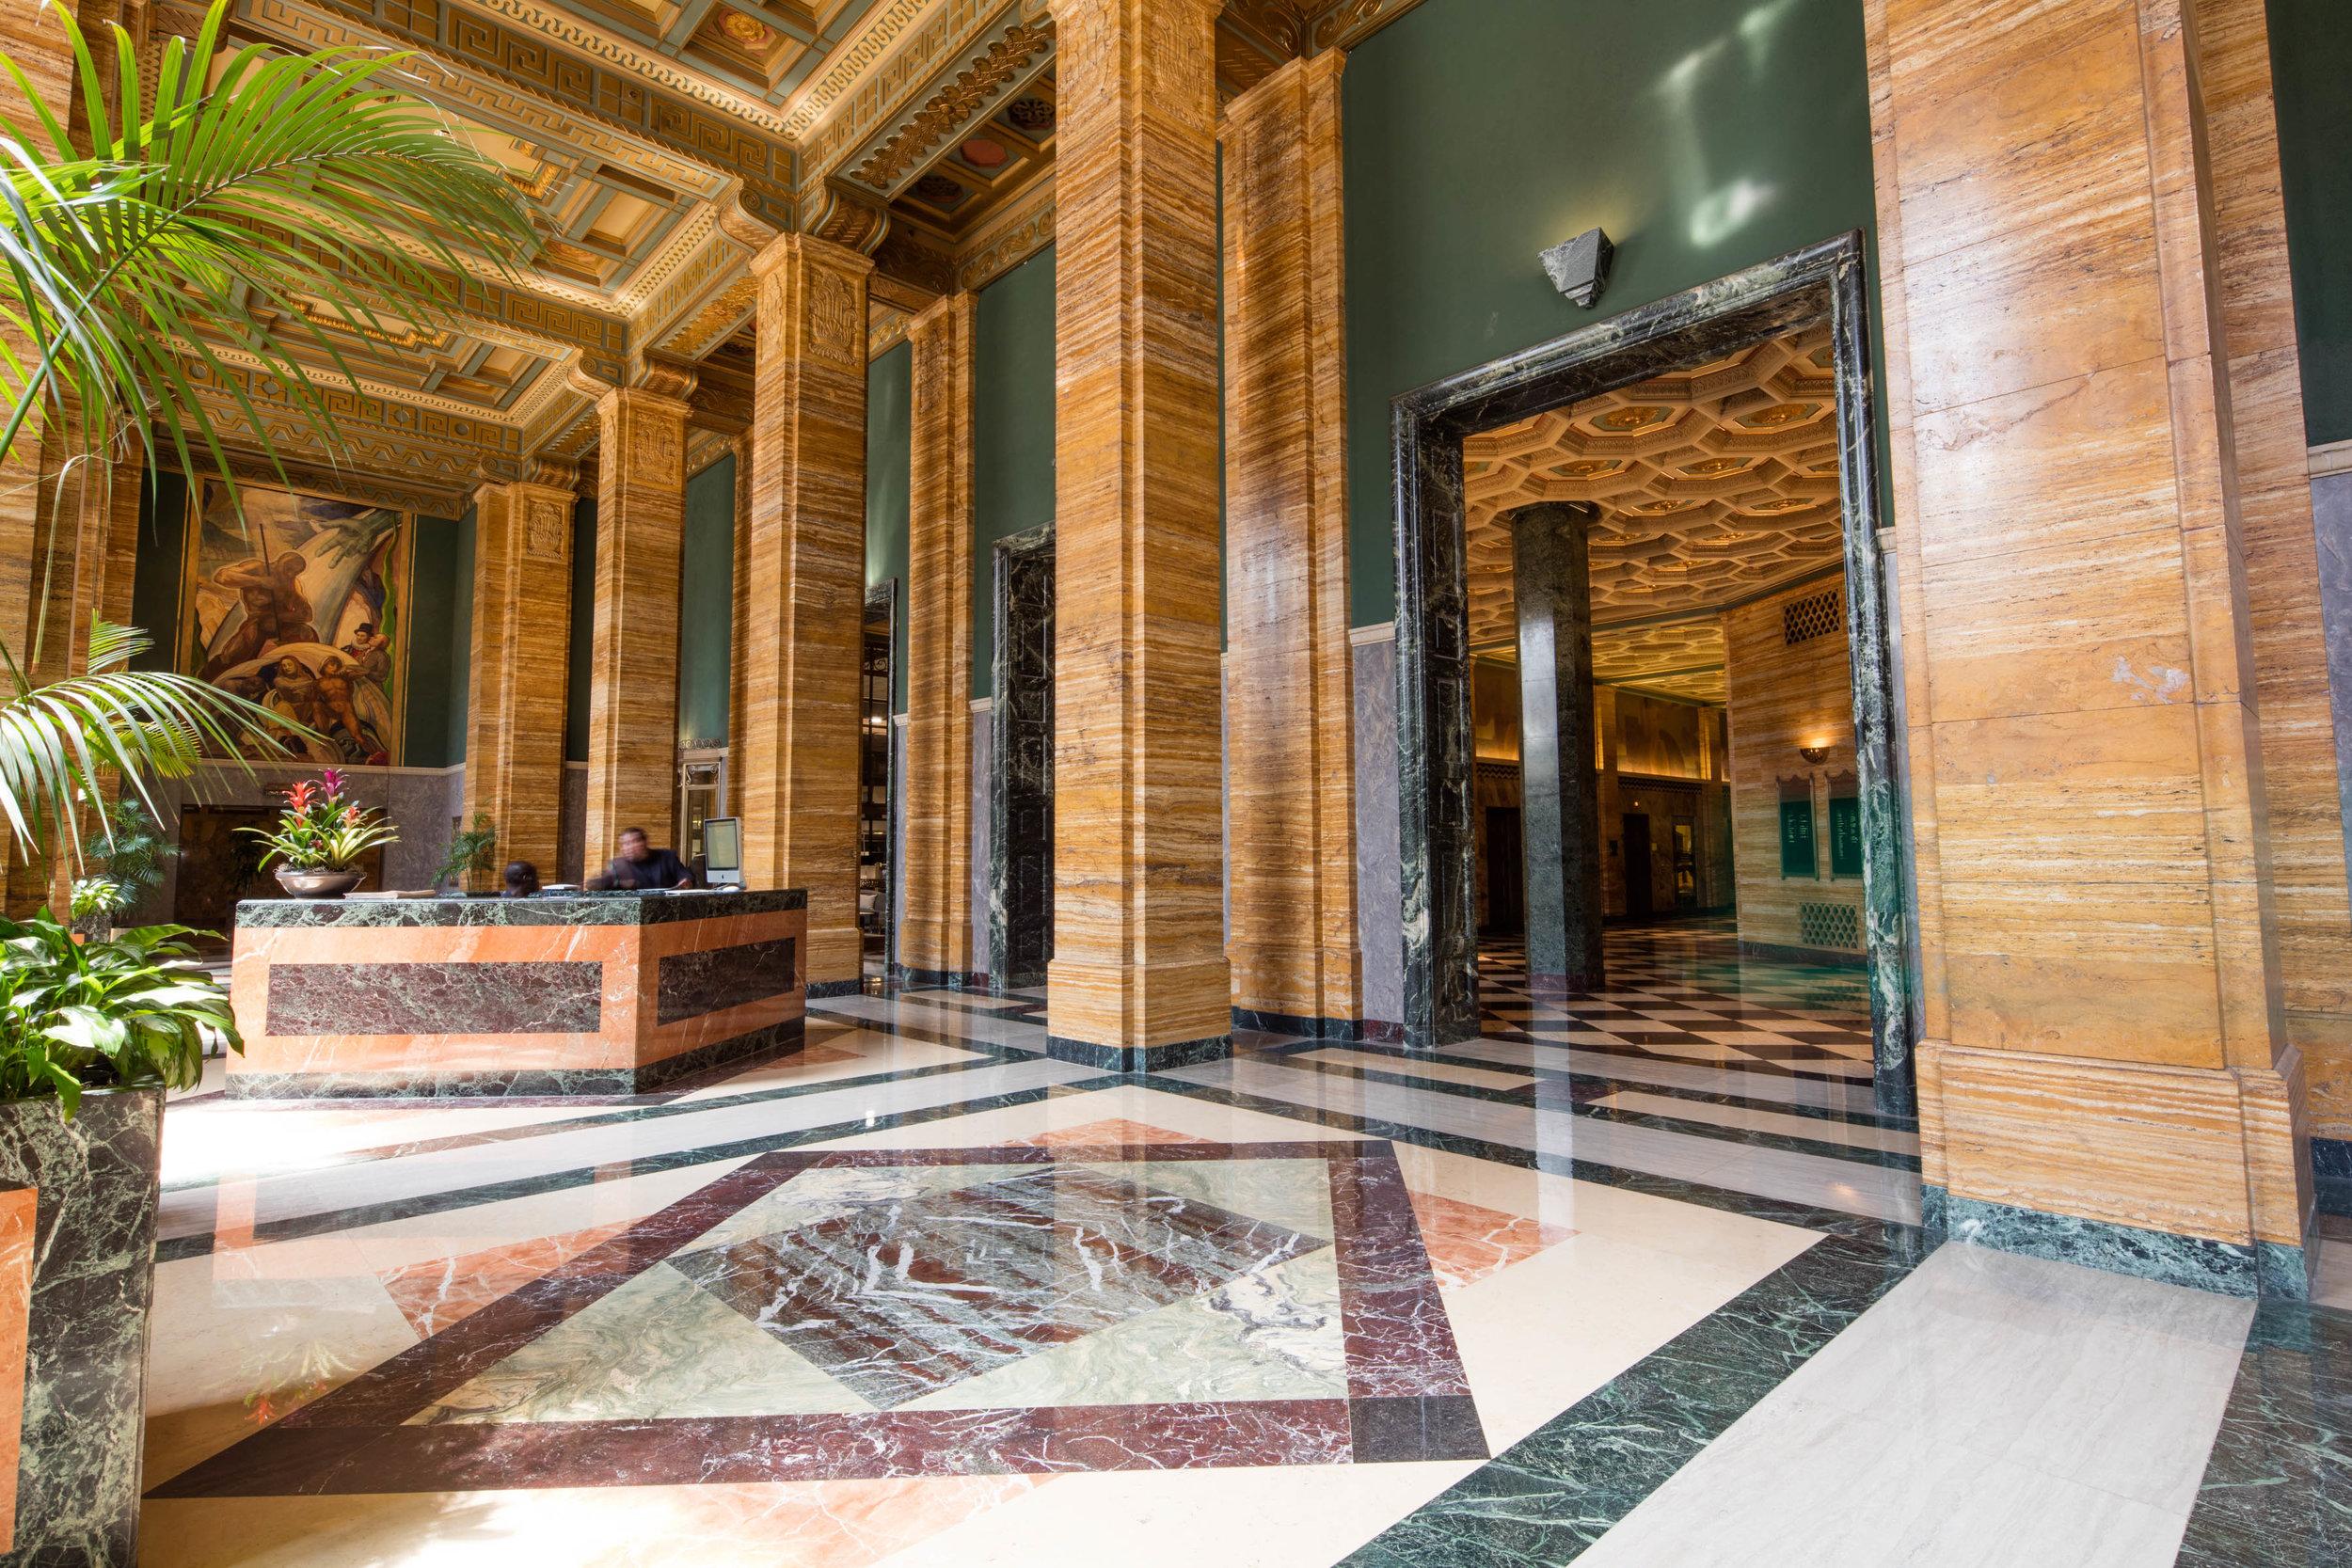 The CalEdison Lobby -  before